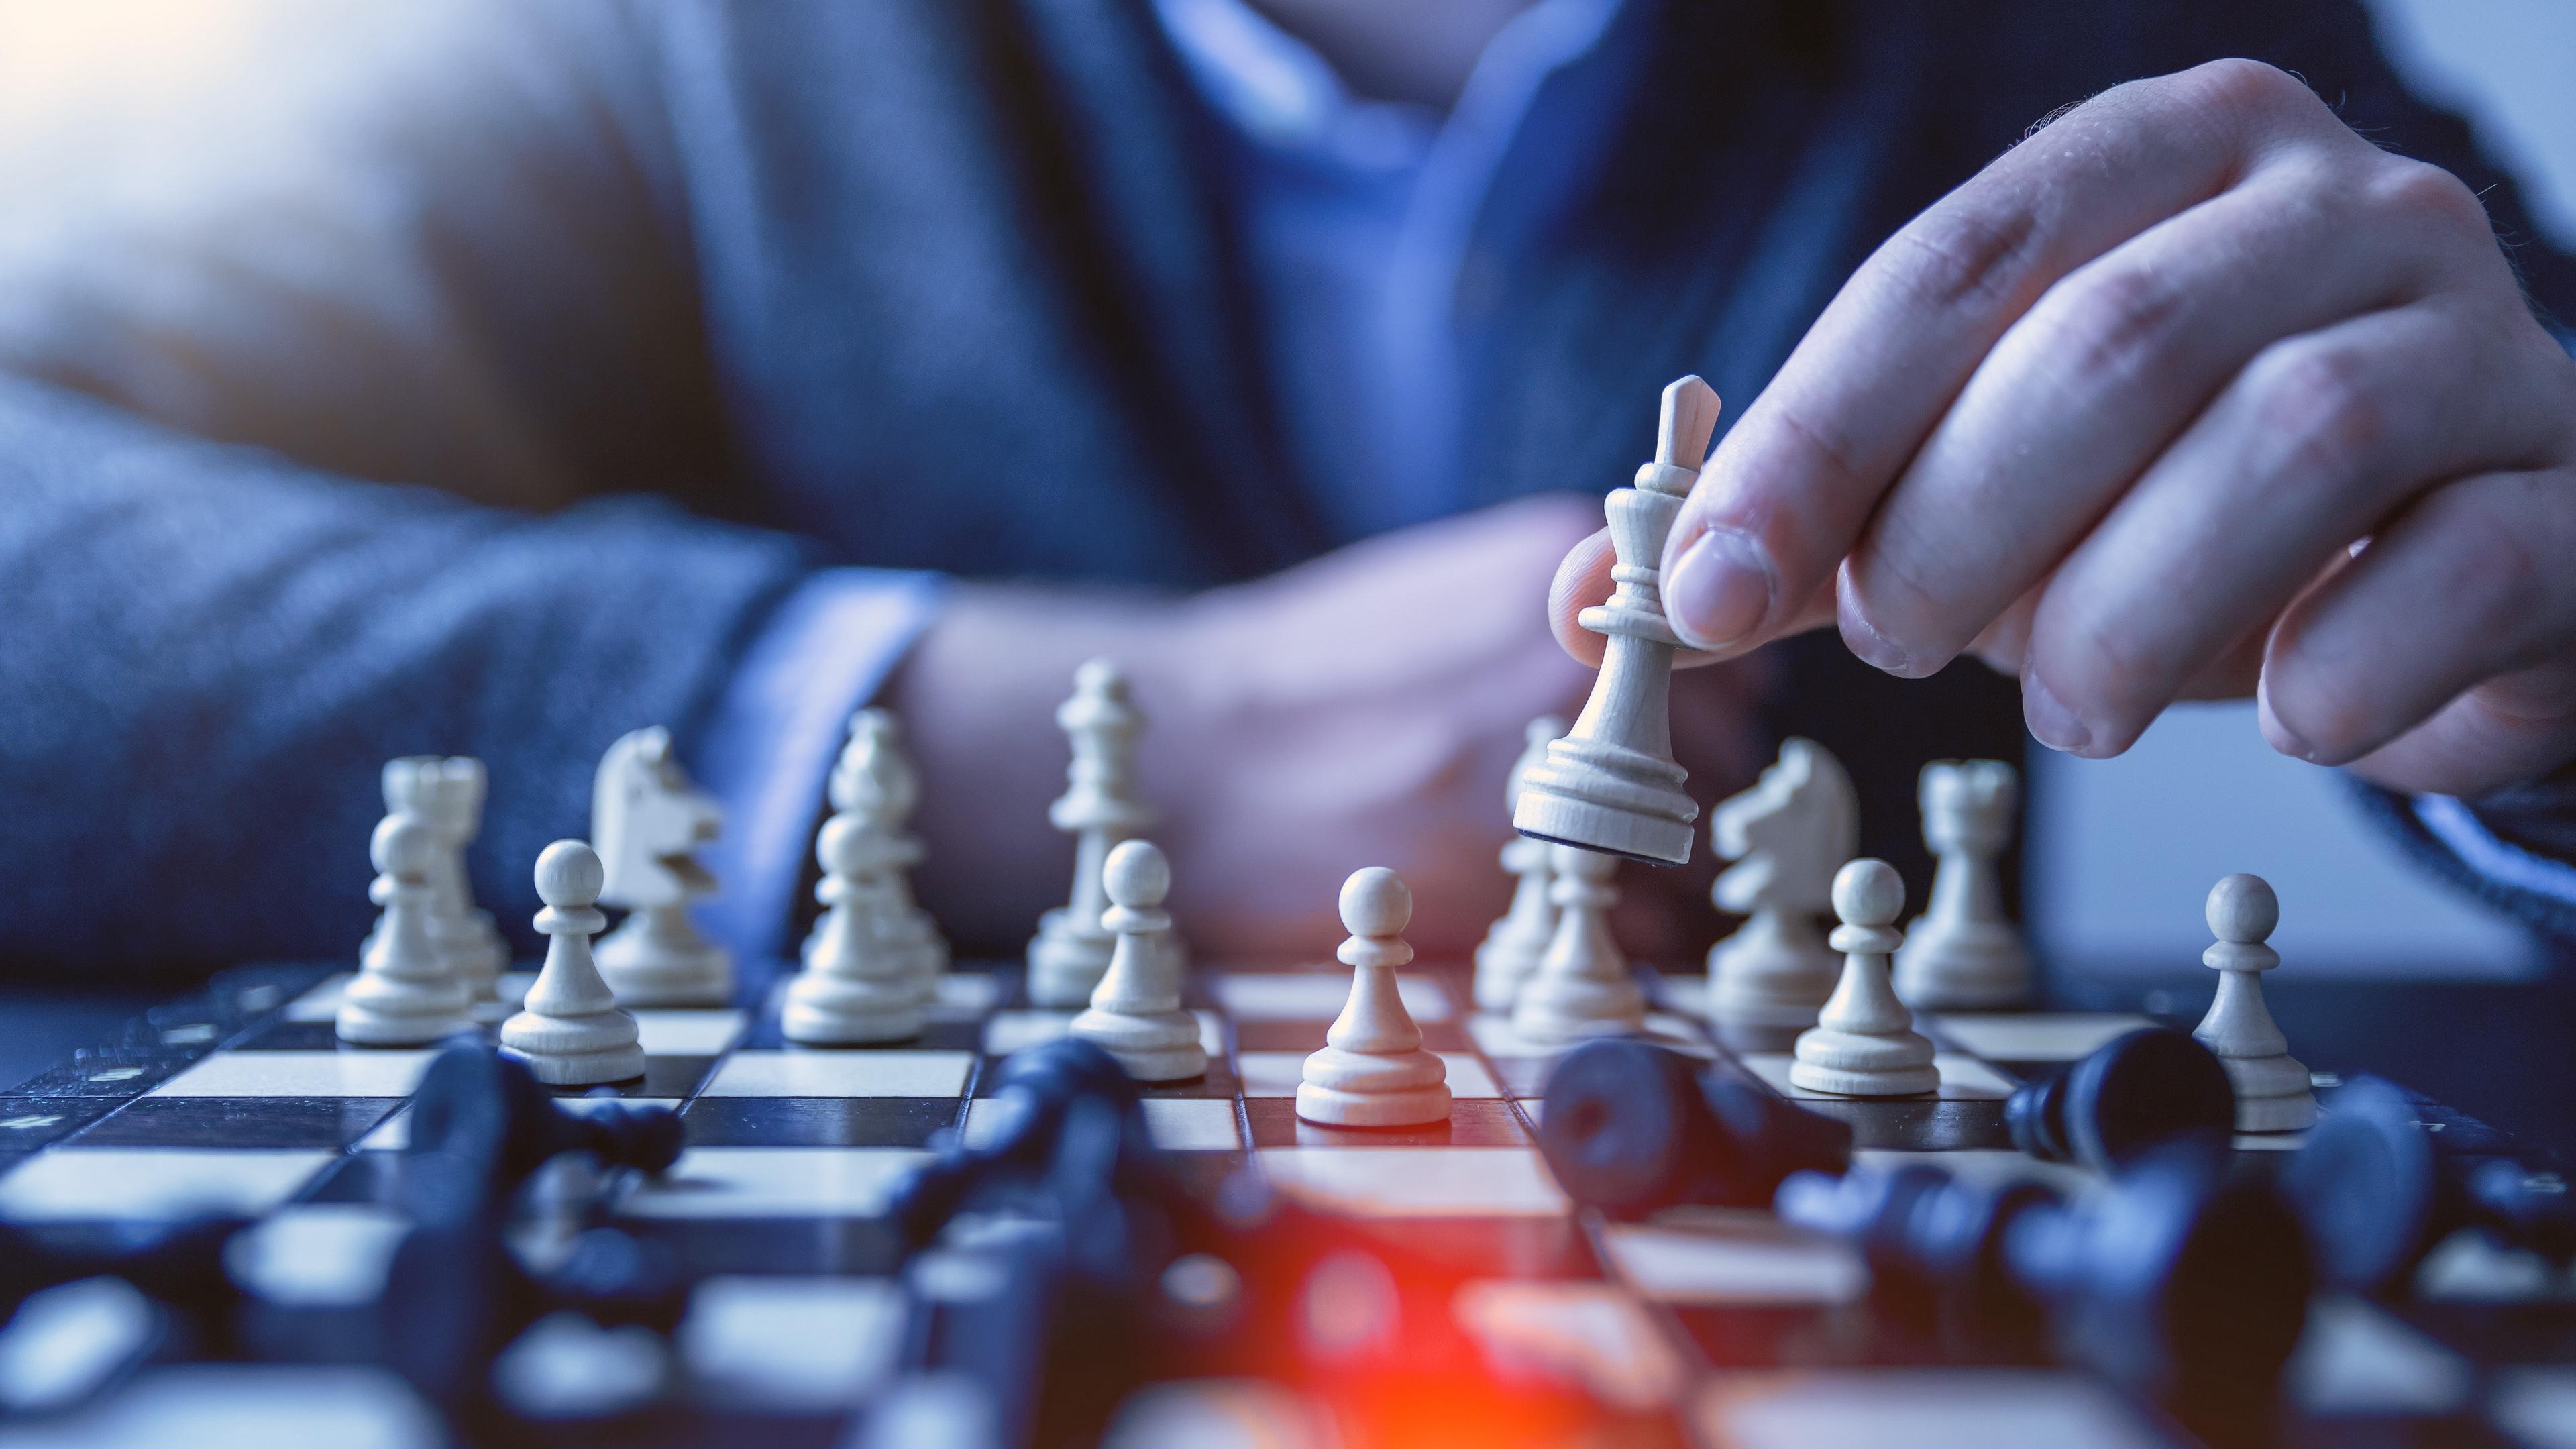 chess pawn queen tactics 4k 1540062816 - chess, pawn, queen, tactics 4k - Queen, pawn, Chess